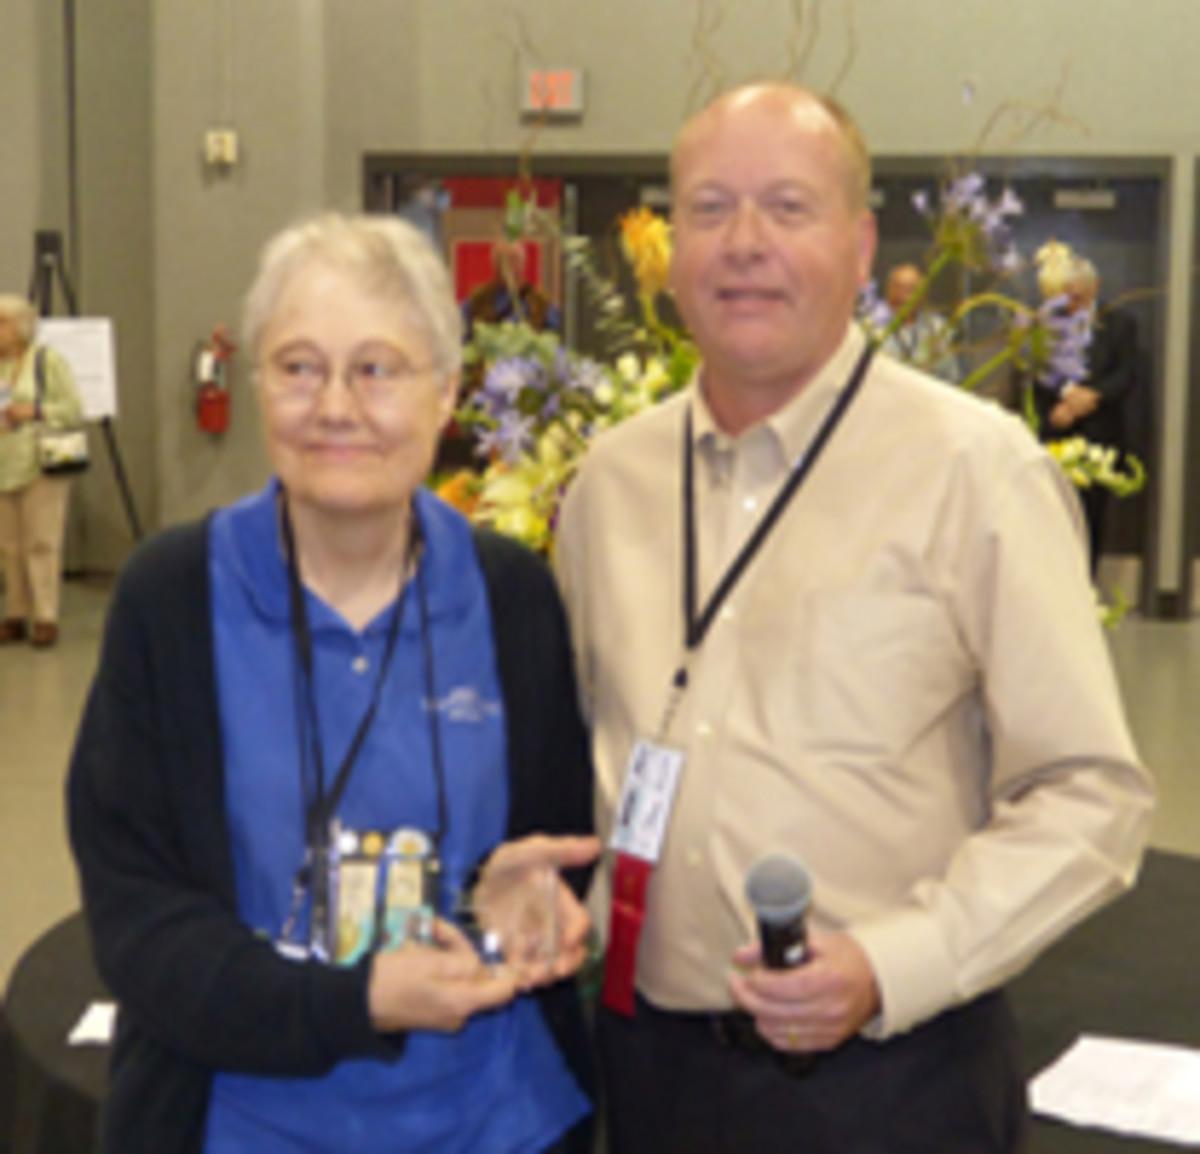 Nancy Wilson took home the SPMC Julian Blanchard Award, presented by Shawn Hewitt.